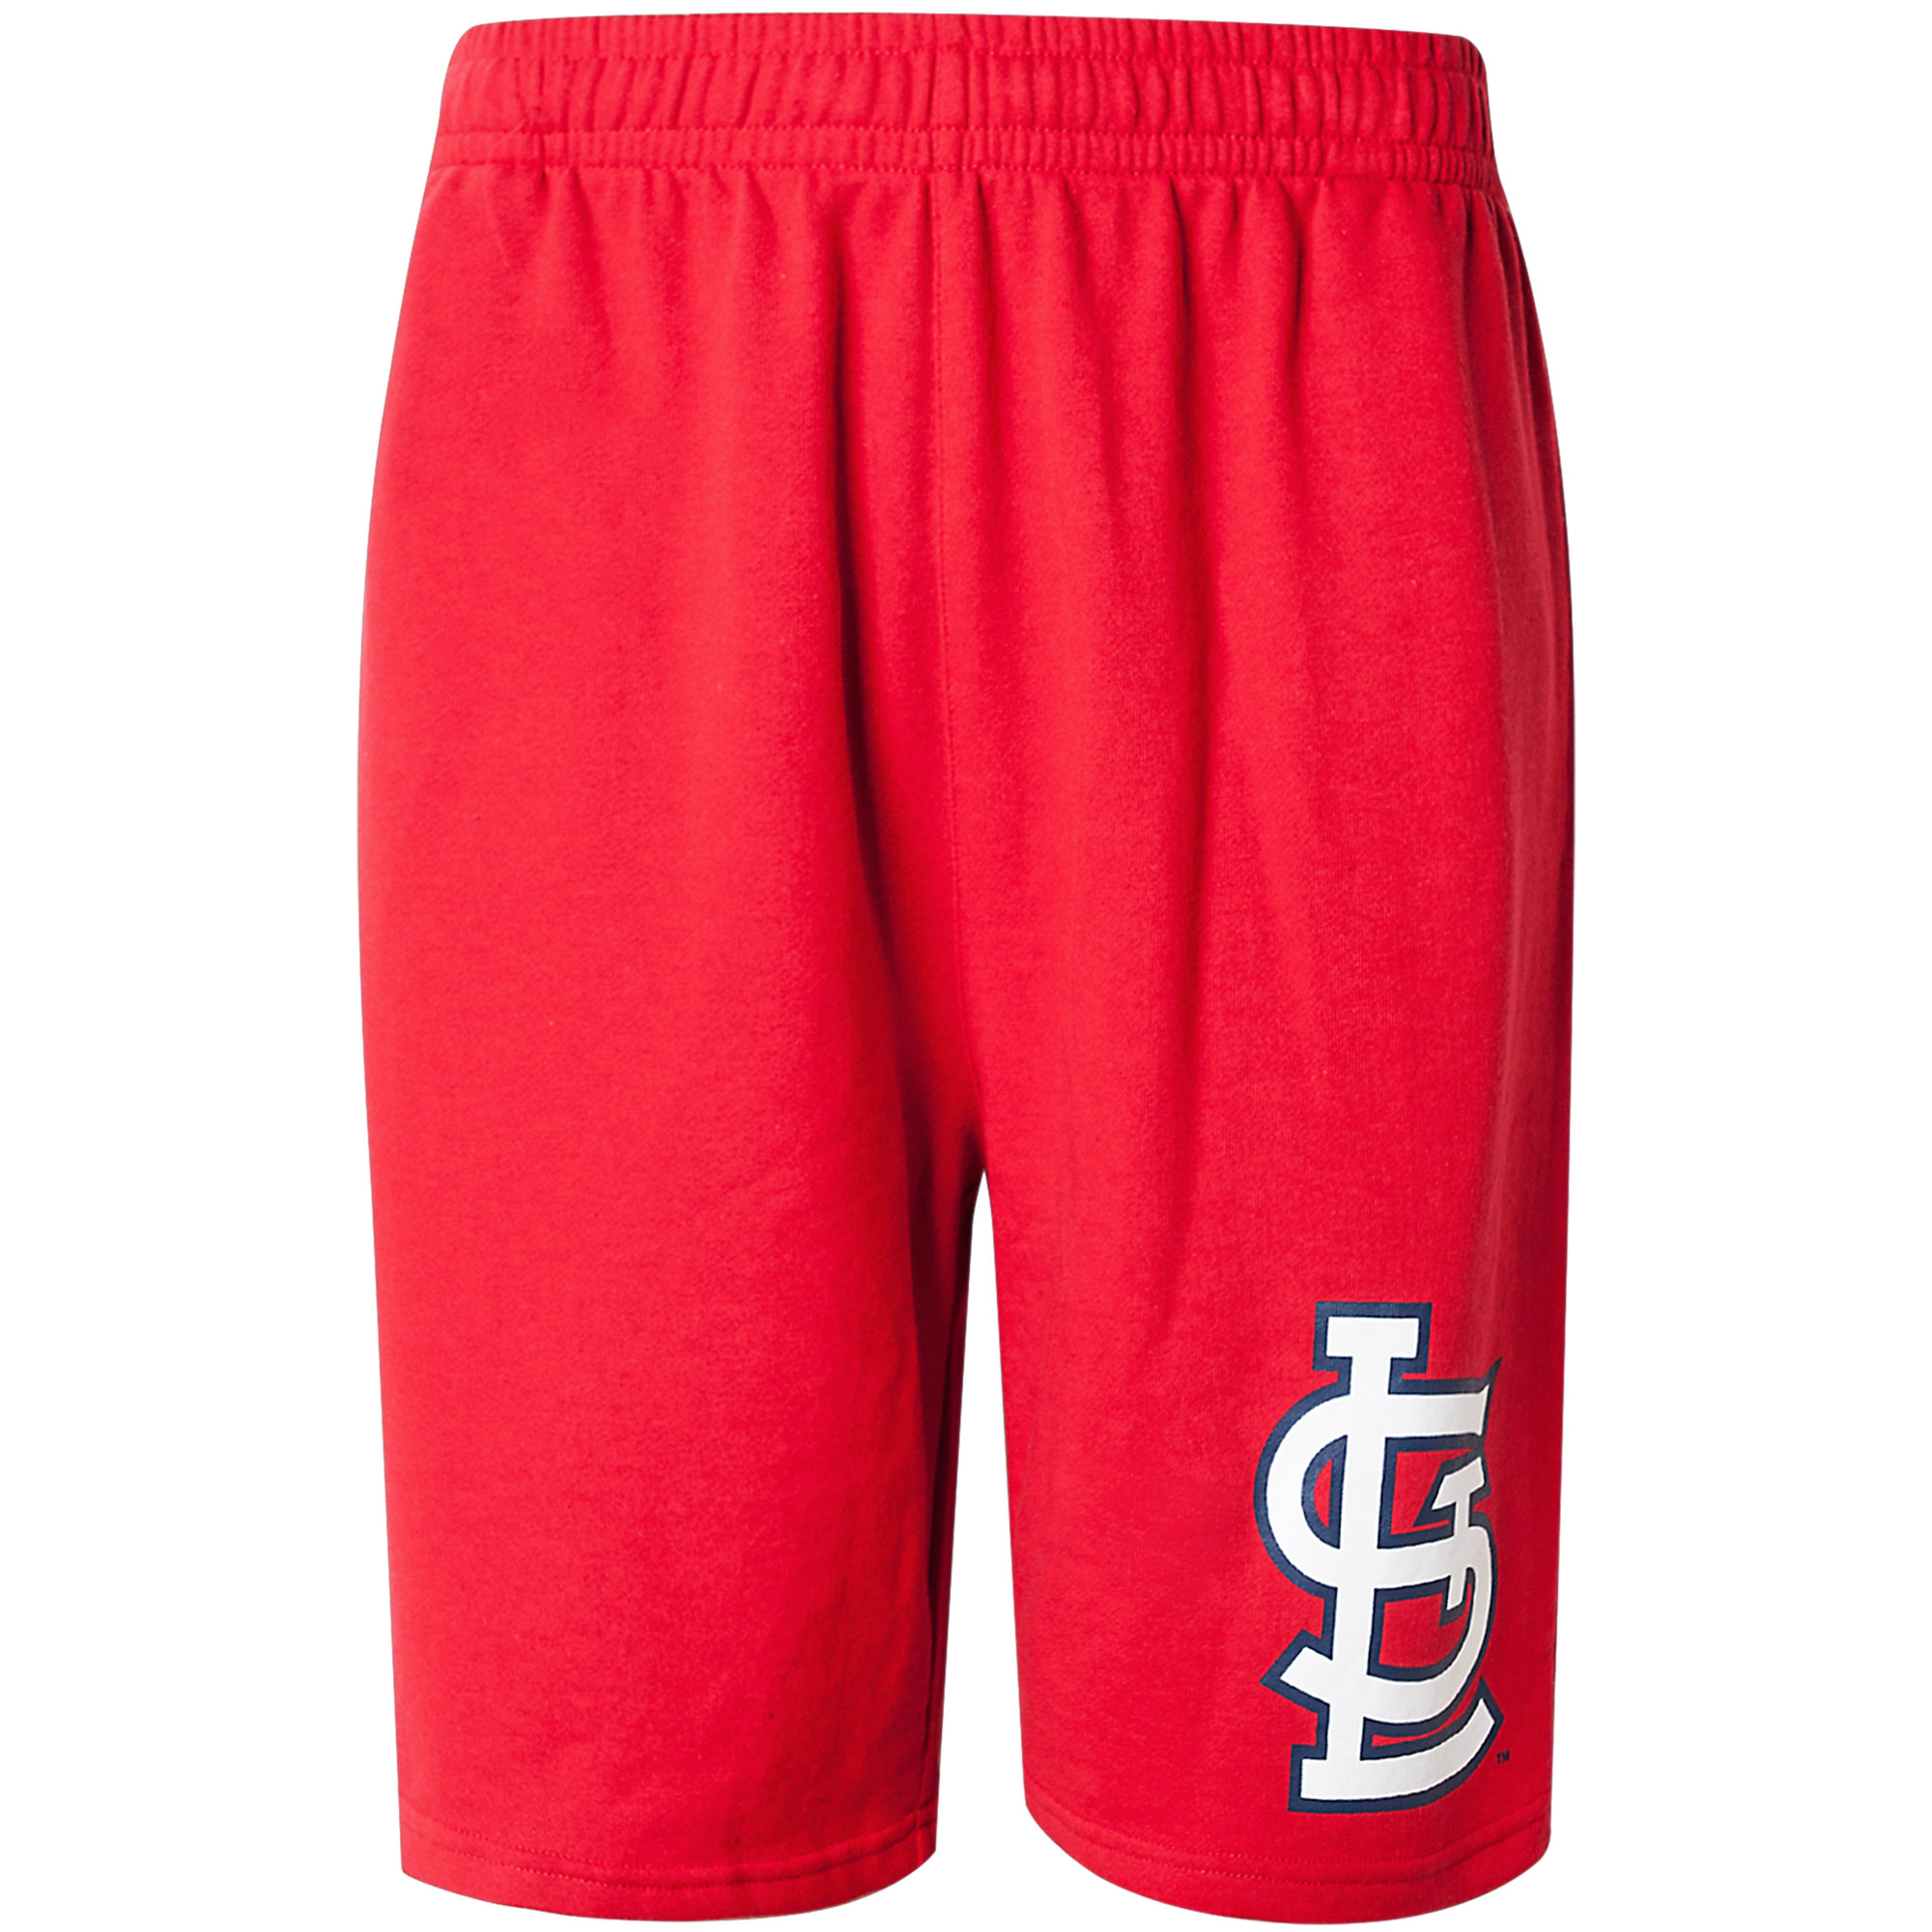 St. Louis Cardinals Concepts Sport Frontrunner Knit Jam Lounge Shorts - Red